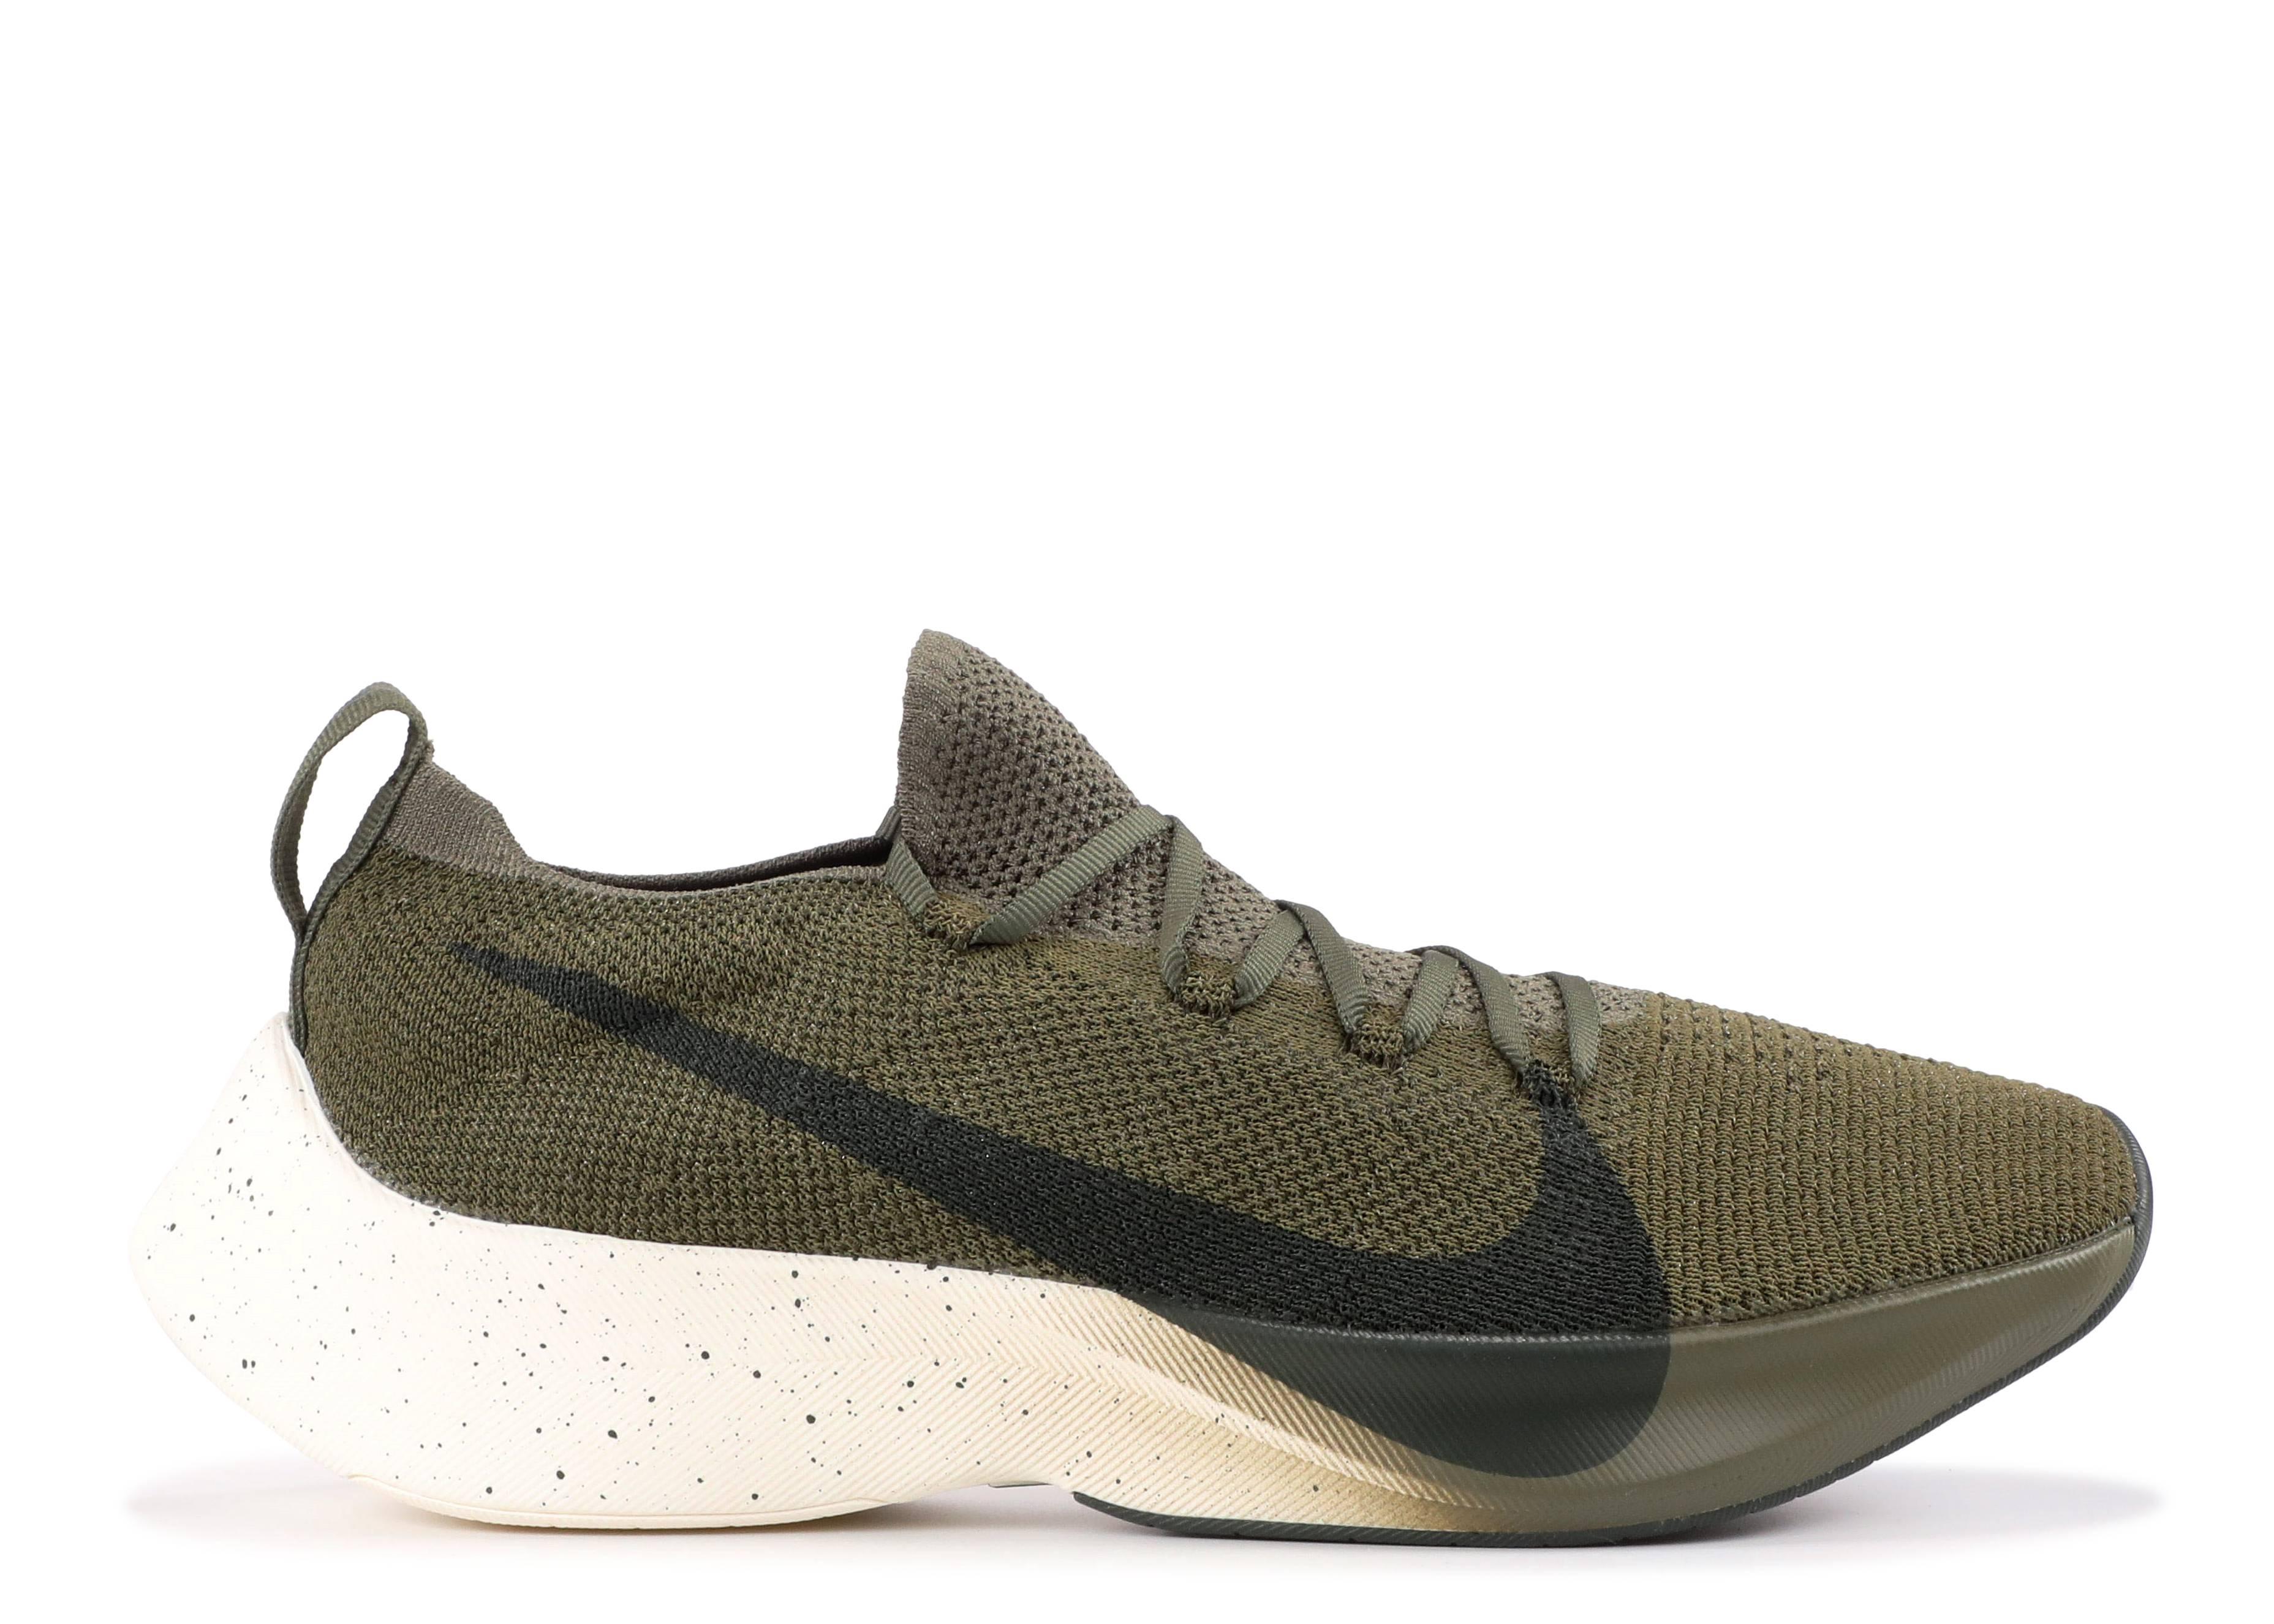 e3f4eb807bcb5 Nike Vapor Street Flyknit - Nike - AQ1763 201 - medium olive sequoia ...